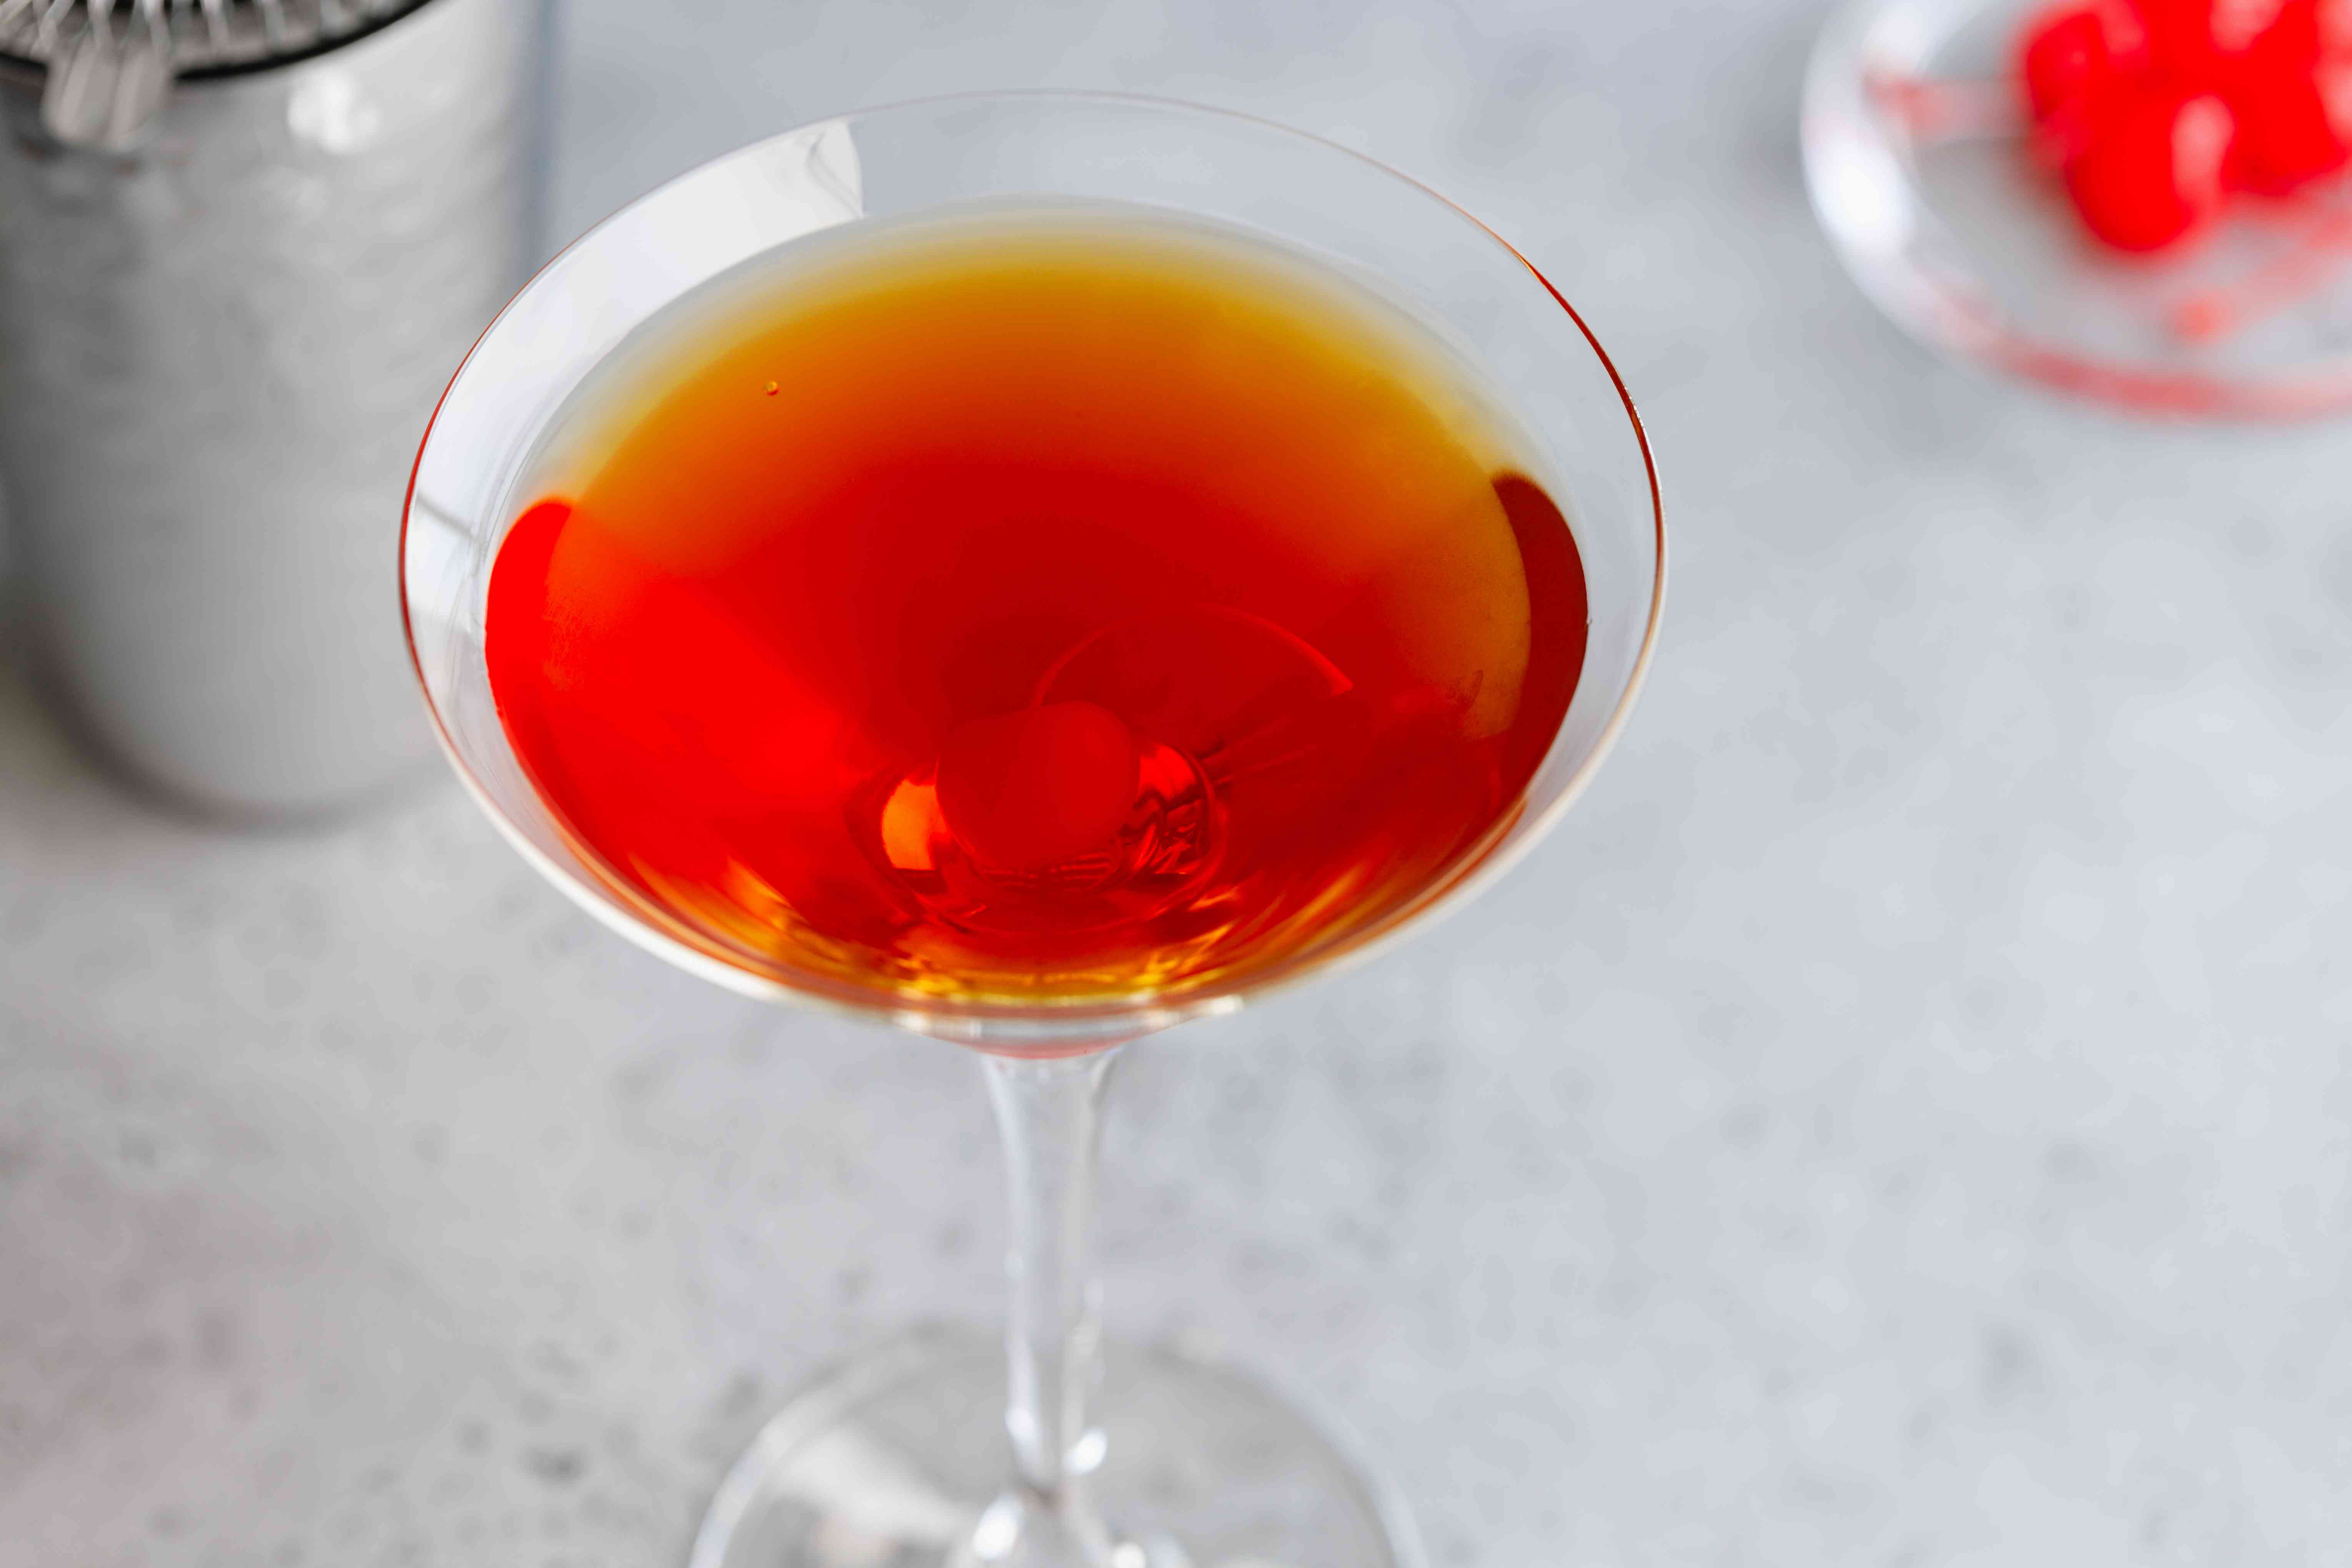 Perfect Manhattan cocktail with Knob Creek bourbon whiskey